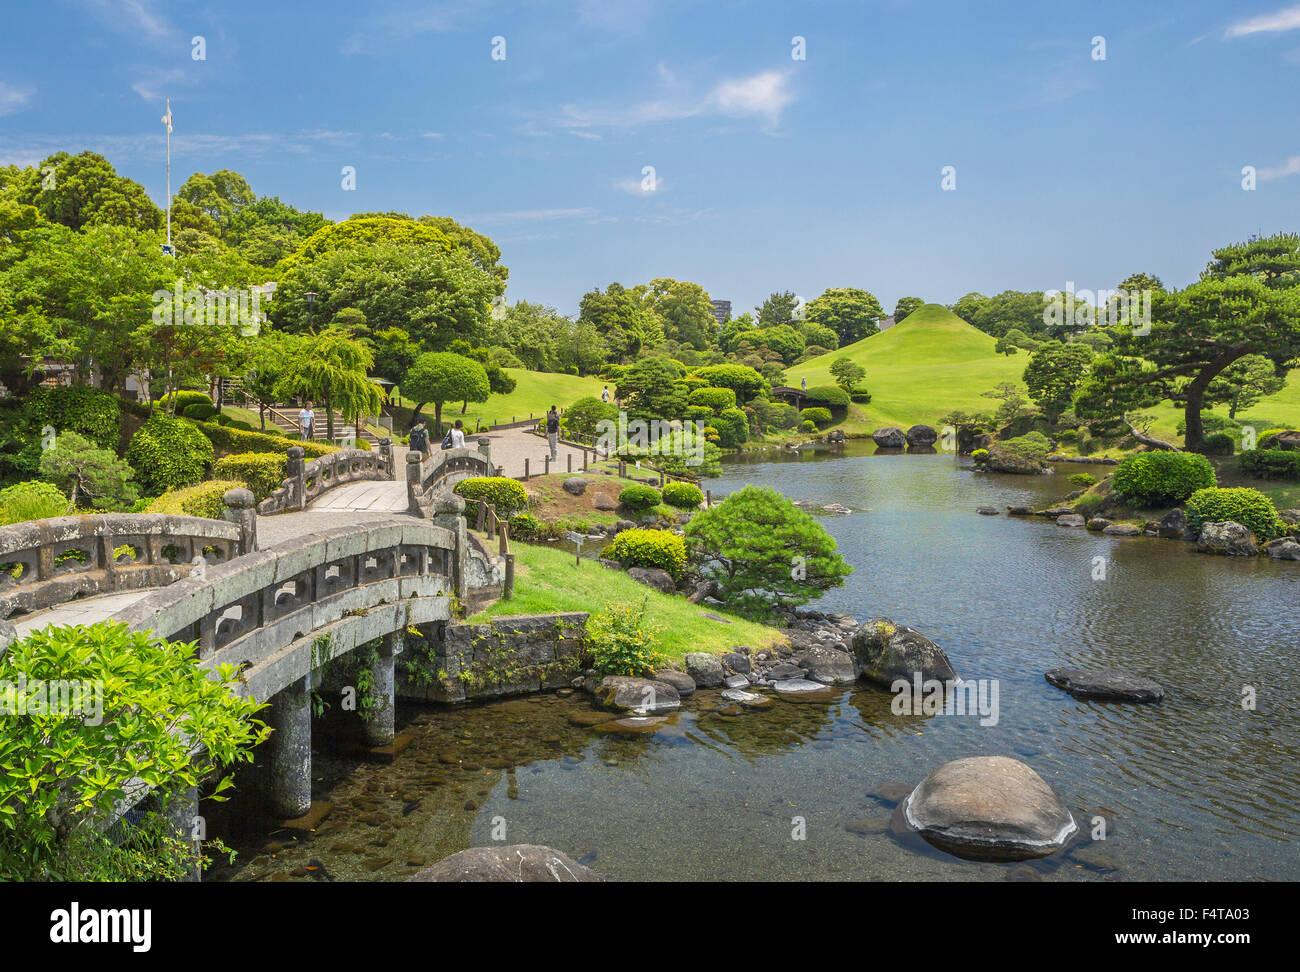 Japan, Kyushu Island, Kumamoto City, Suizenji Garden - Stock Image